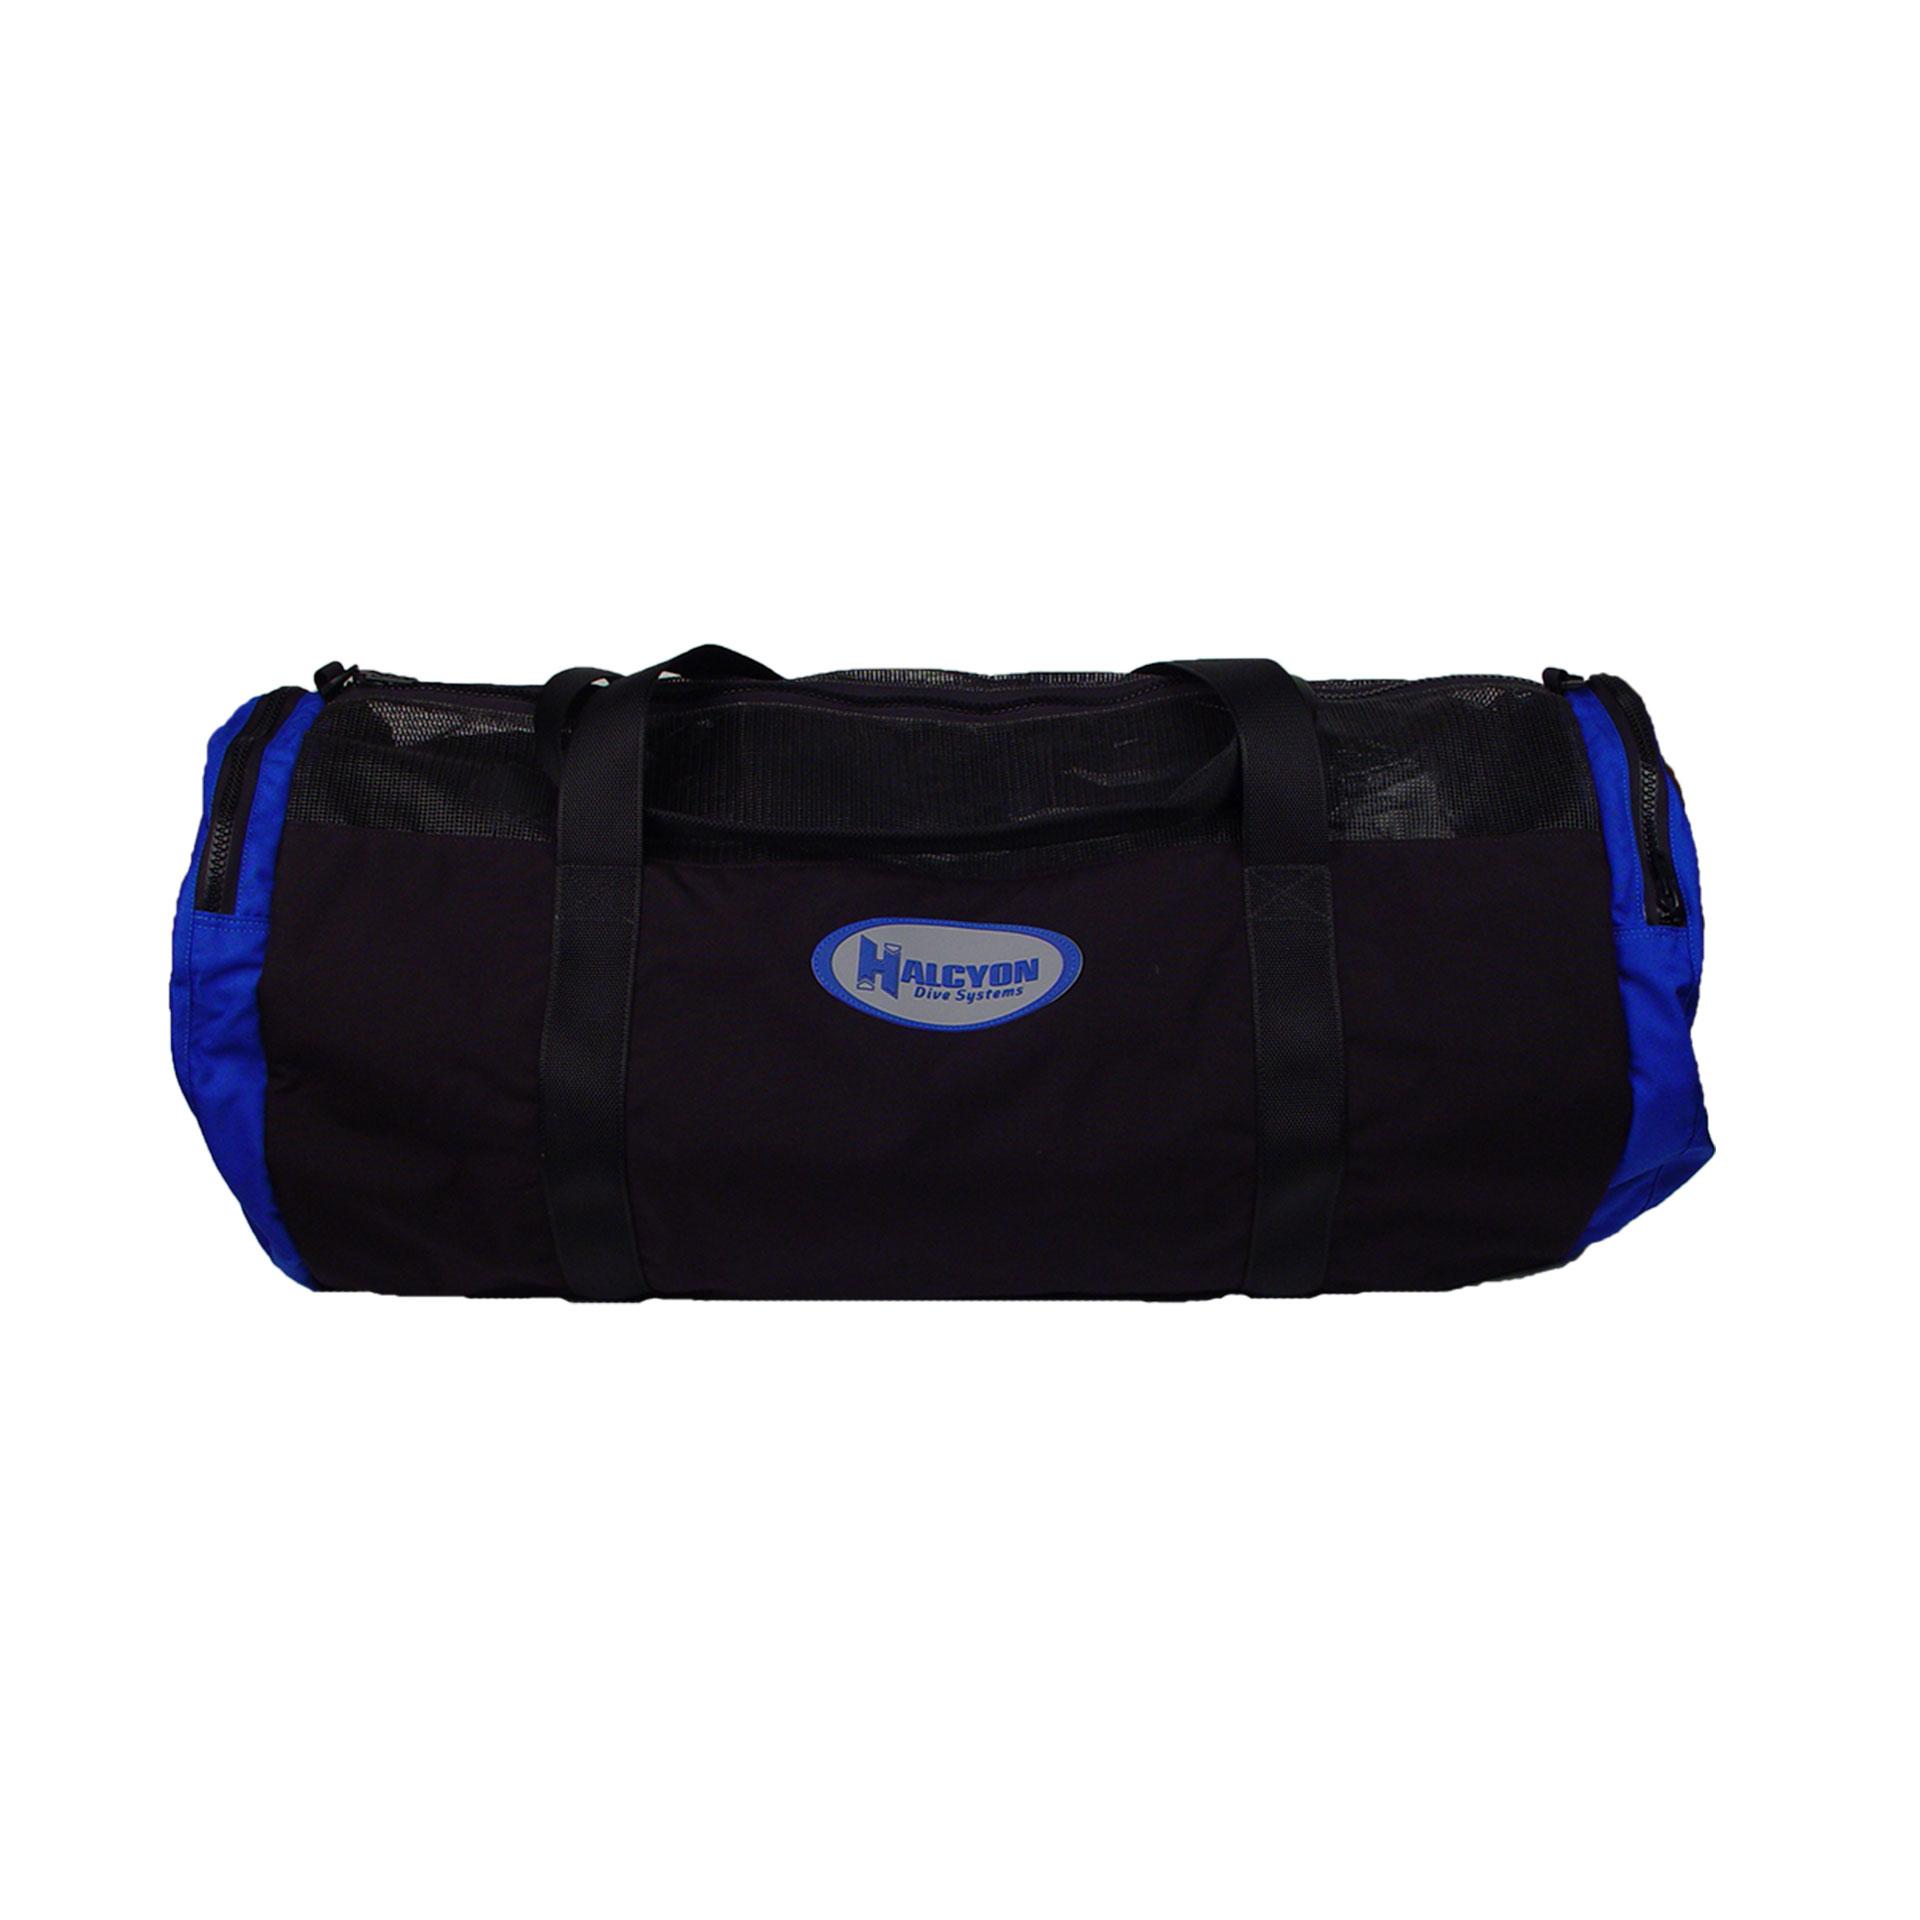 Premium Gear Bag